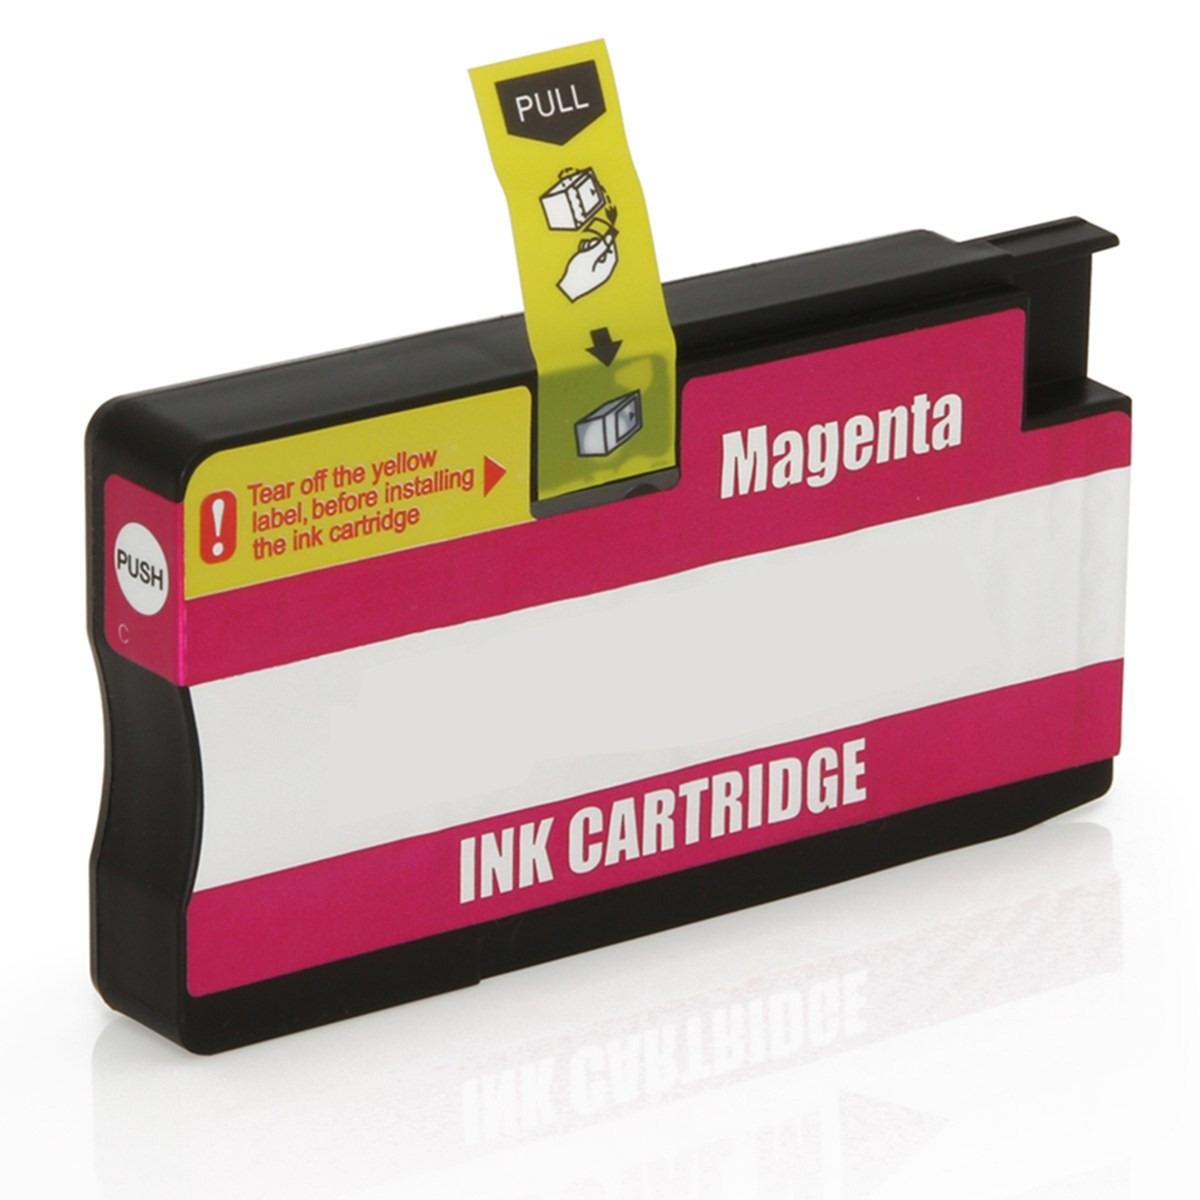 Cartucho de Tinta Compatível com HP 954XL L0S65AB Magenta | 7730 7740 8210 8710 8720 | 26ml